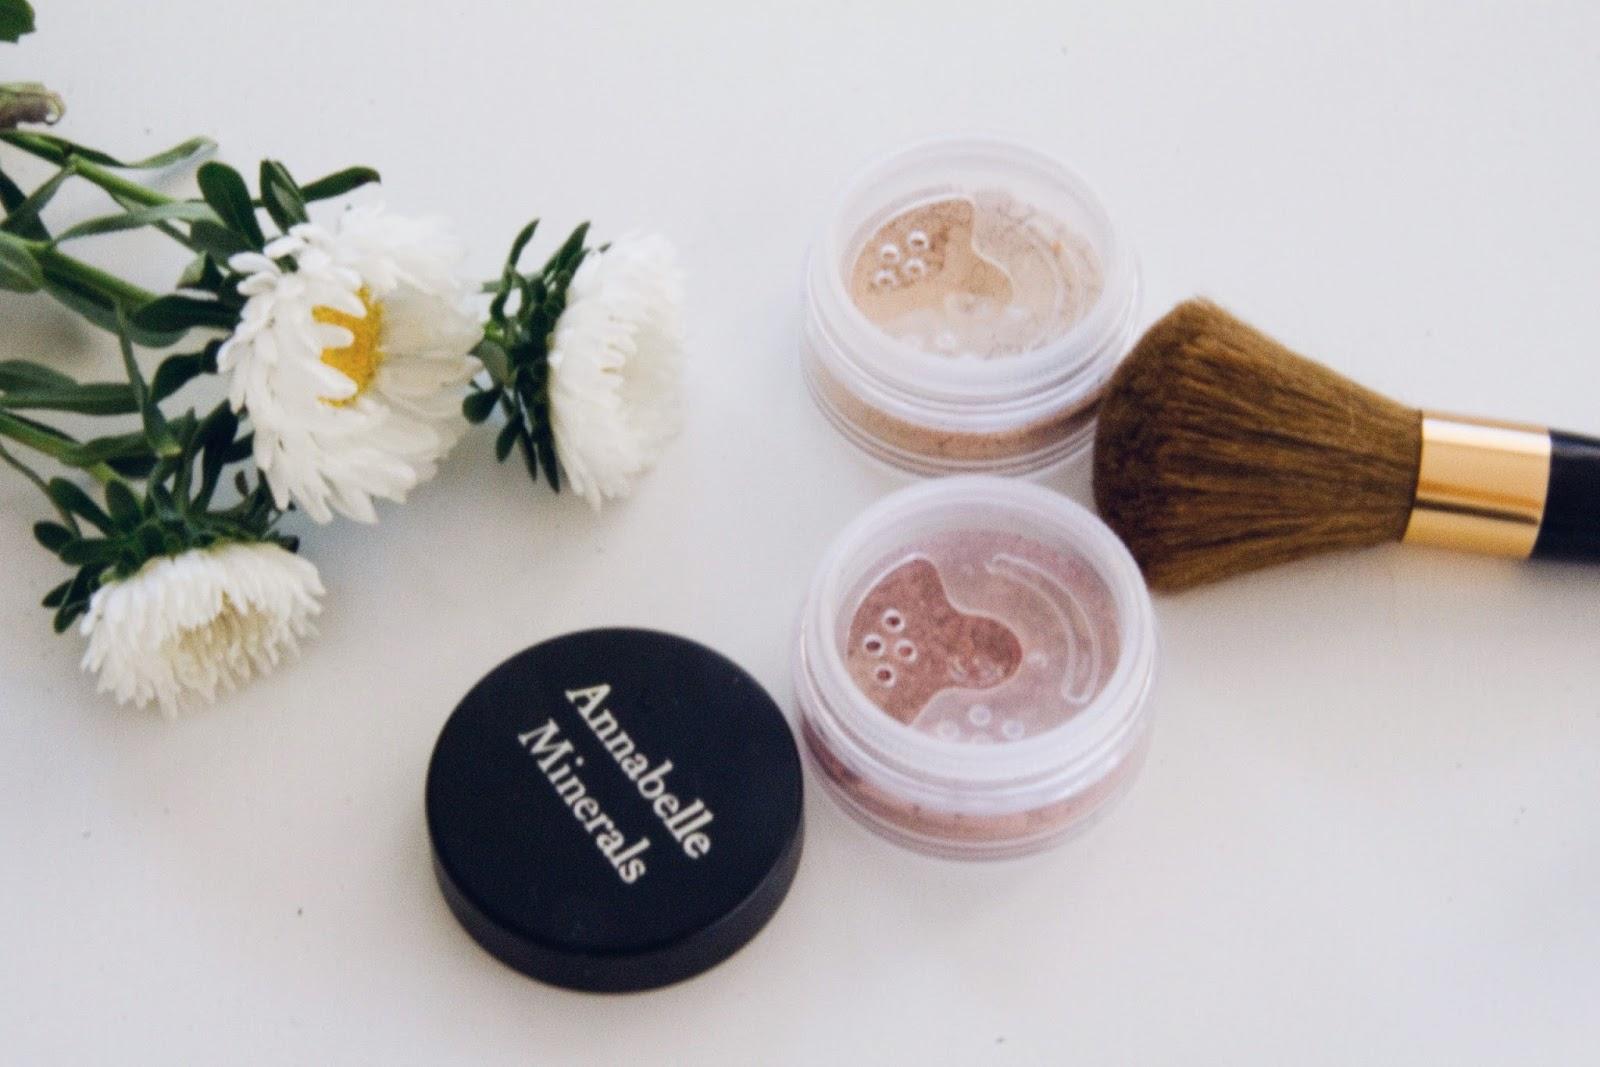 kosmetyki naturalne mineralne